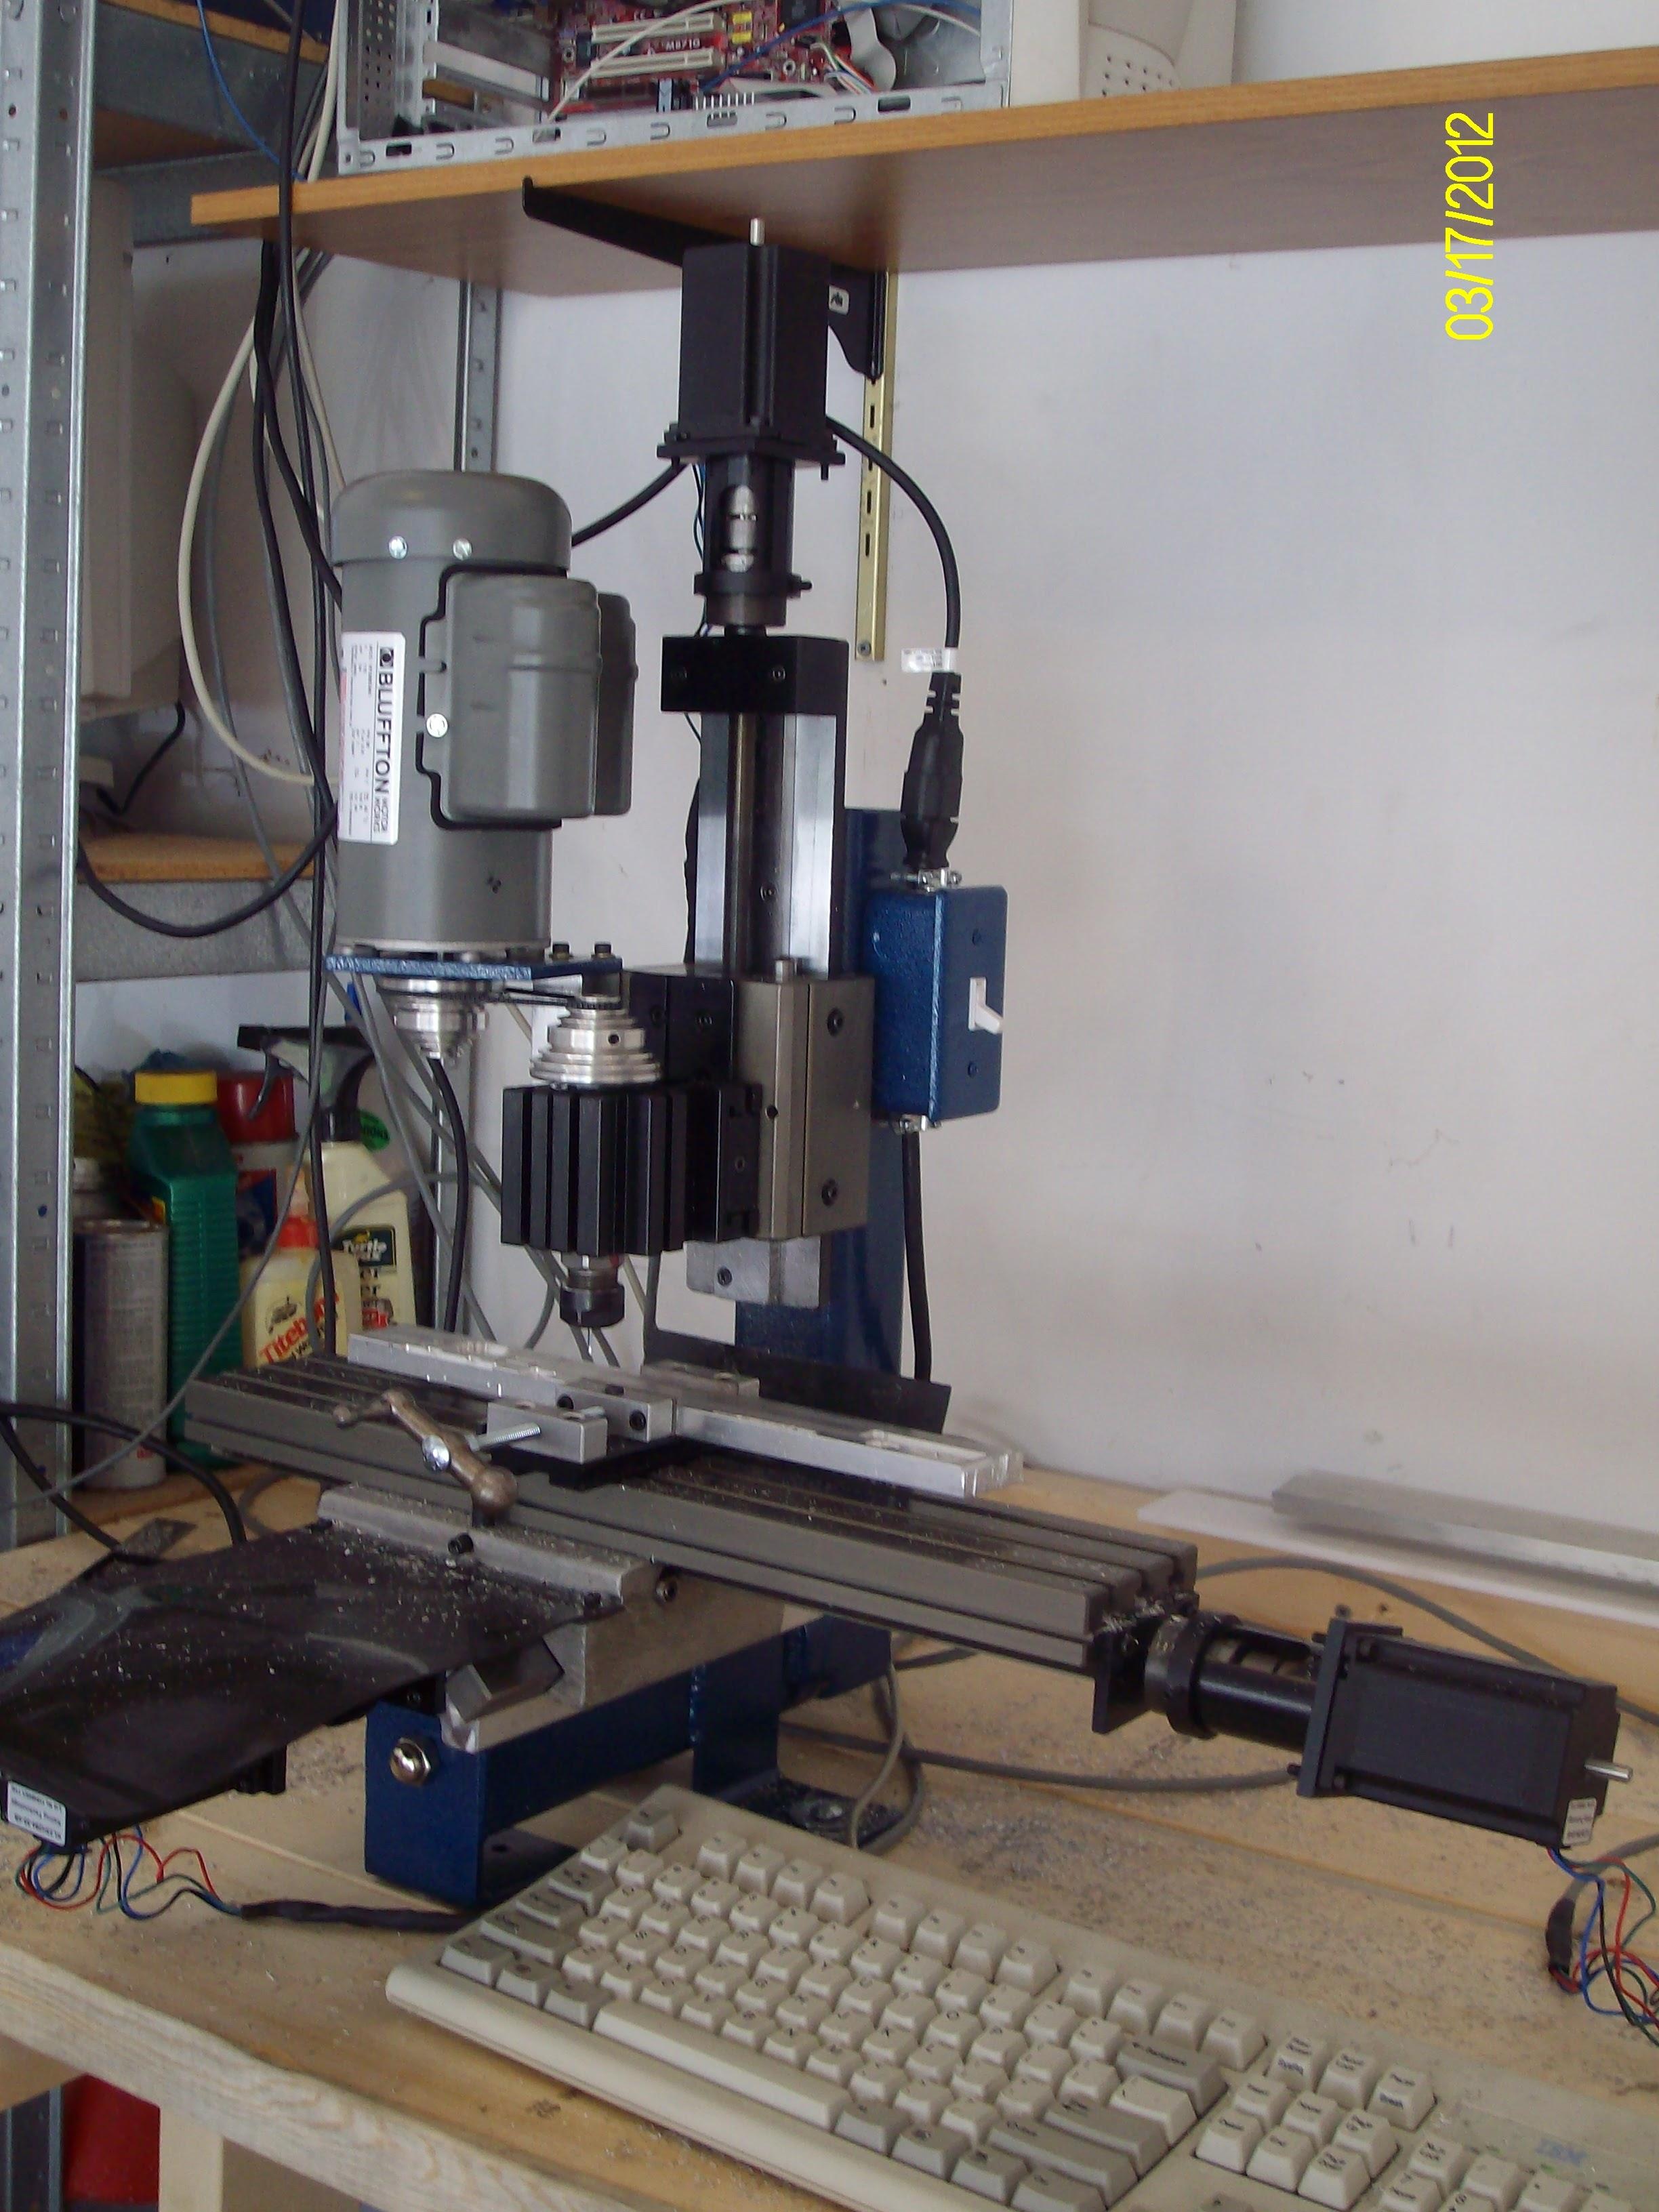 Taig CNC mini-mill close-up